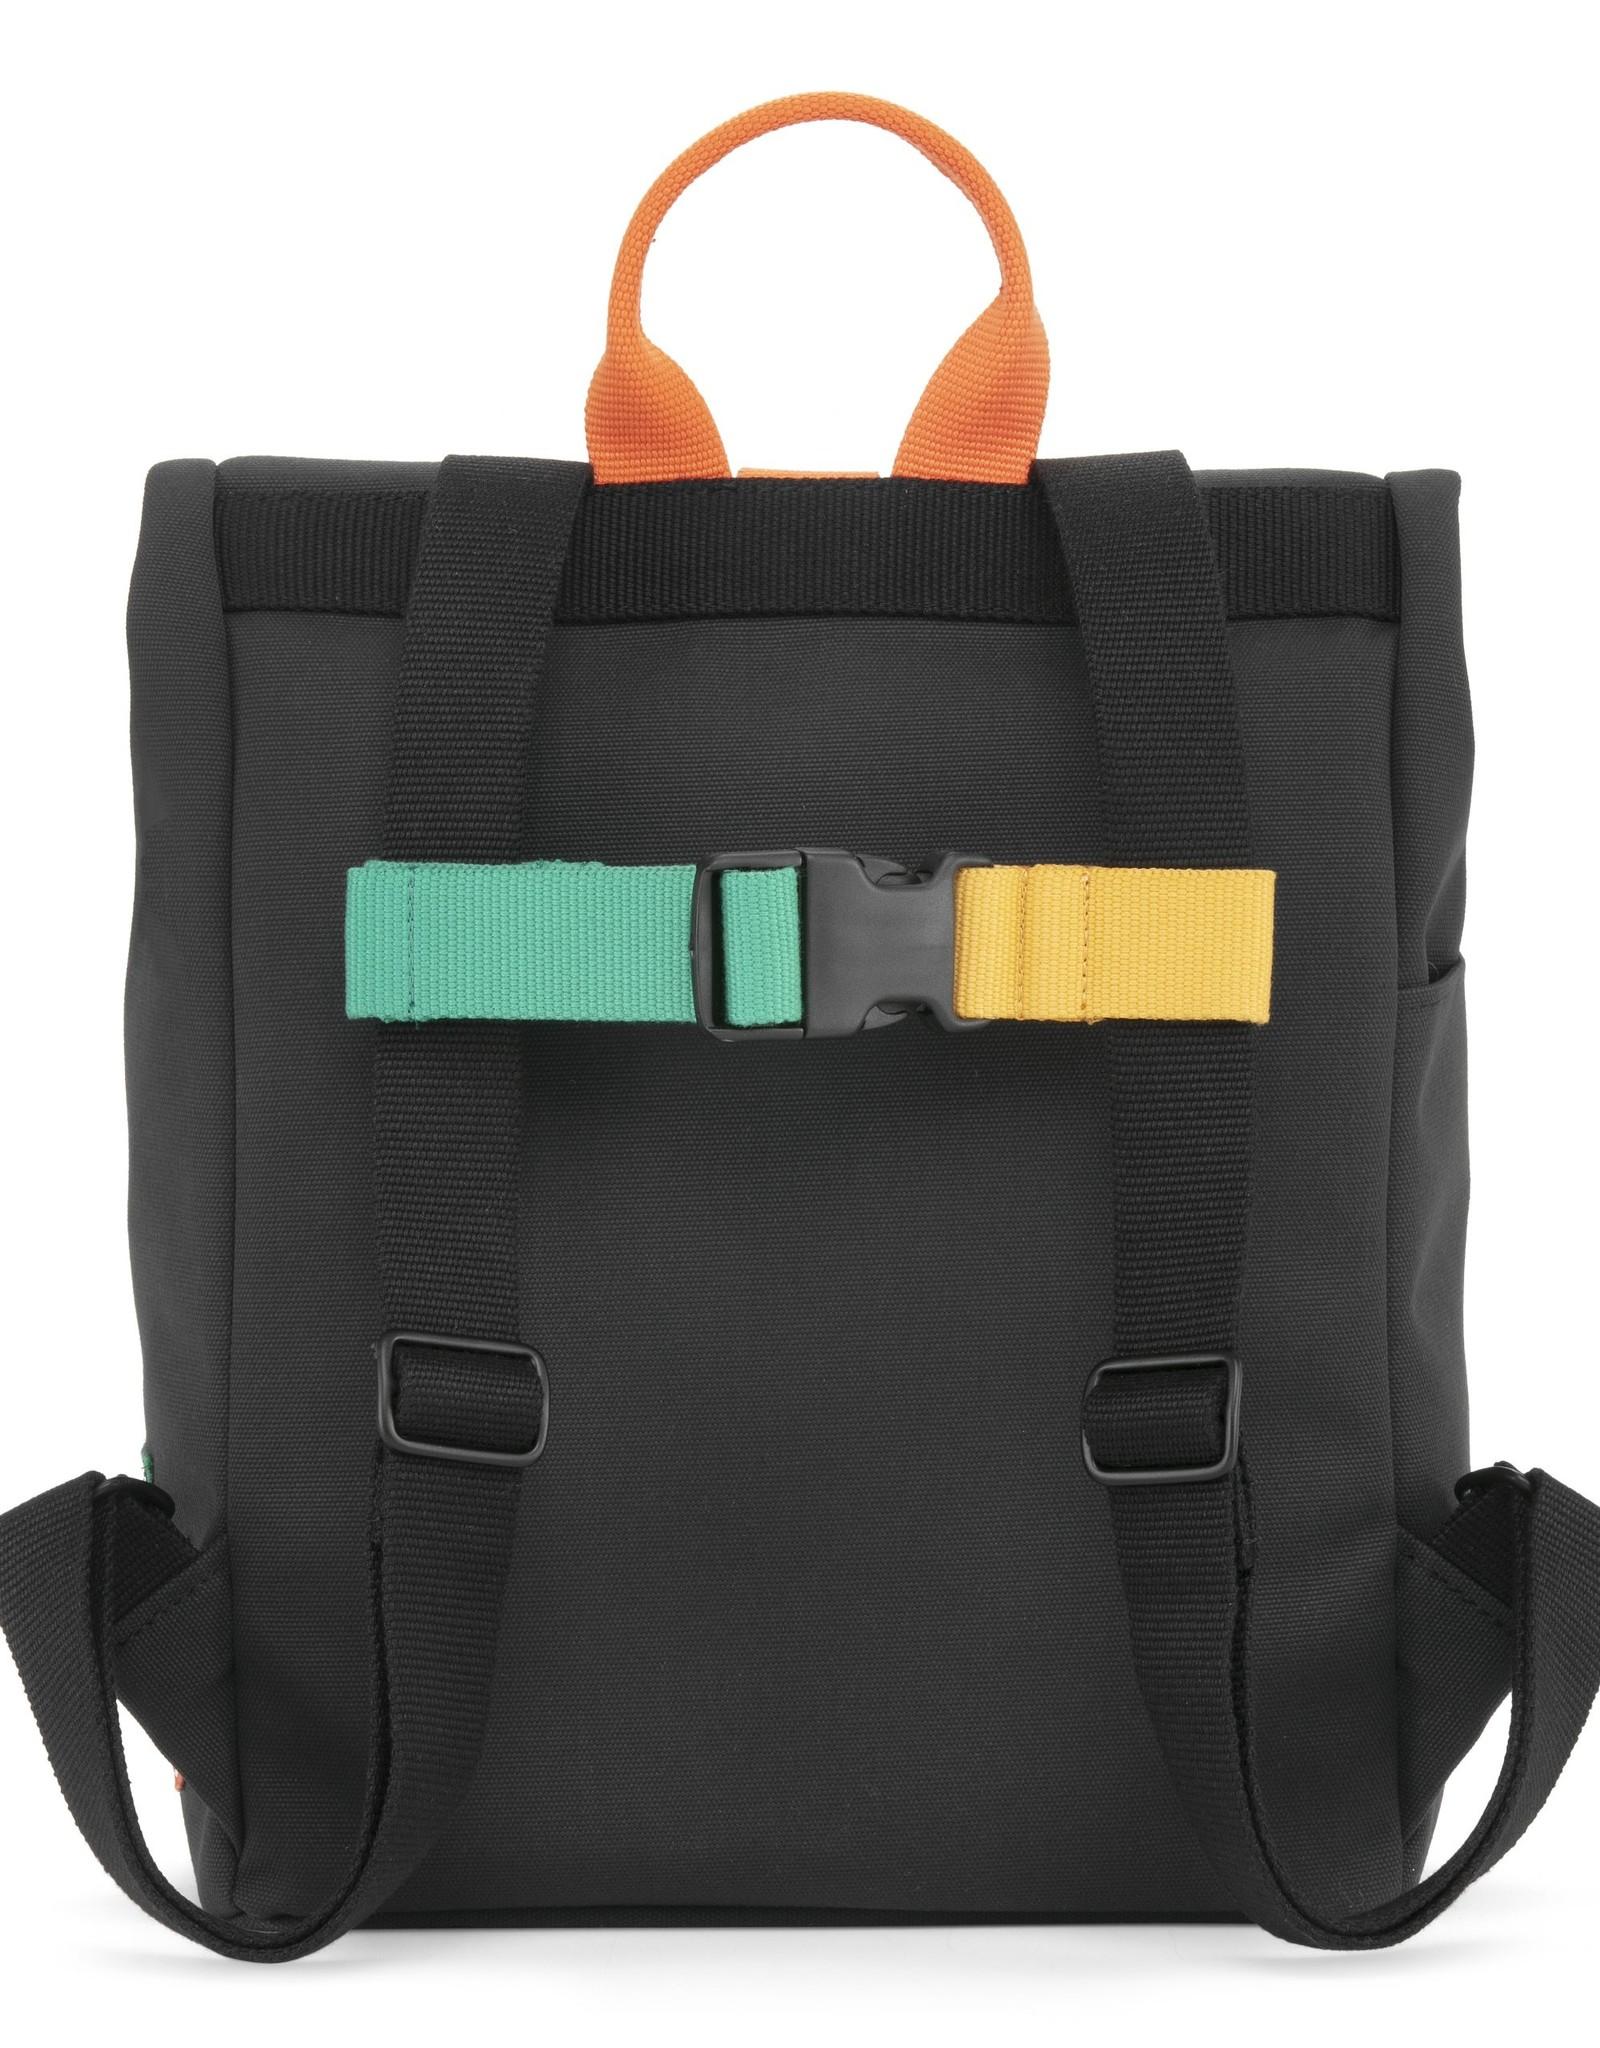 Dusq Dusq 'Mini Bag' Canvas Rugtas Night Black